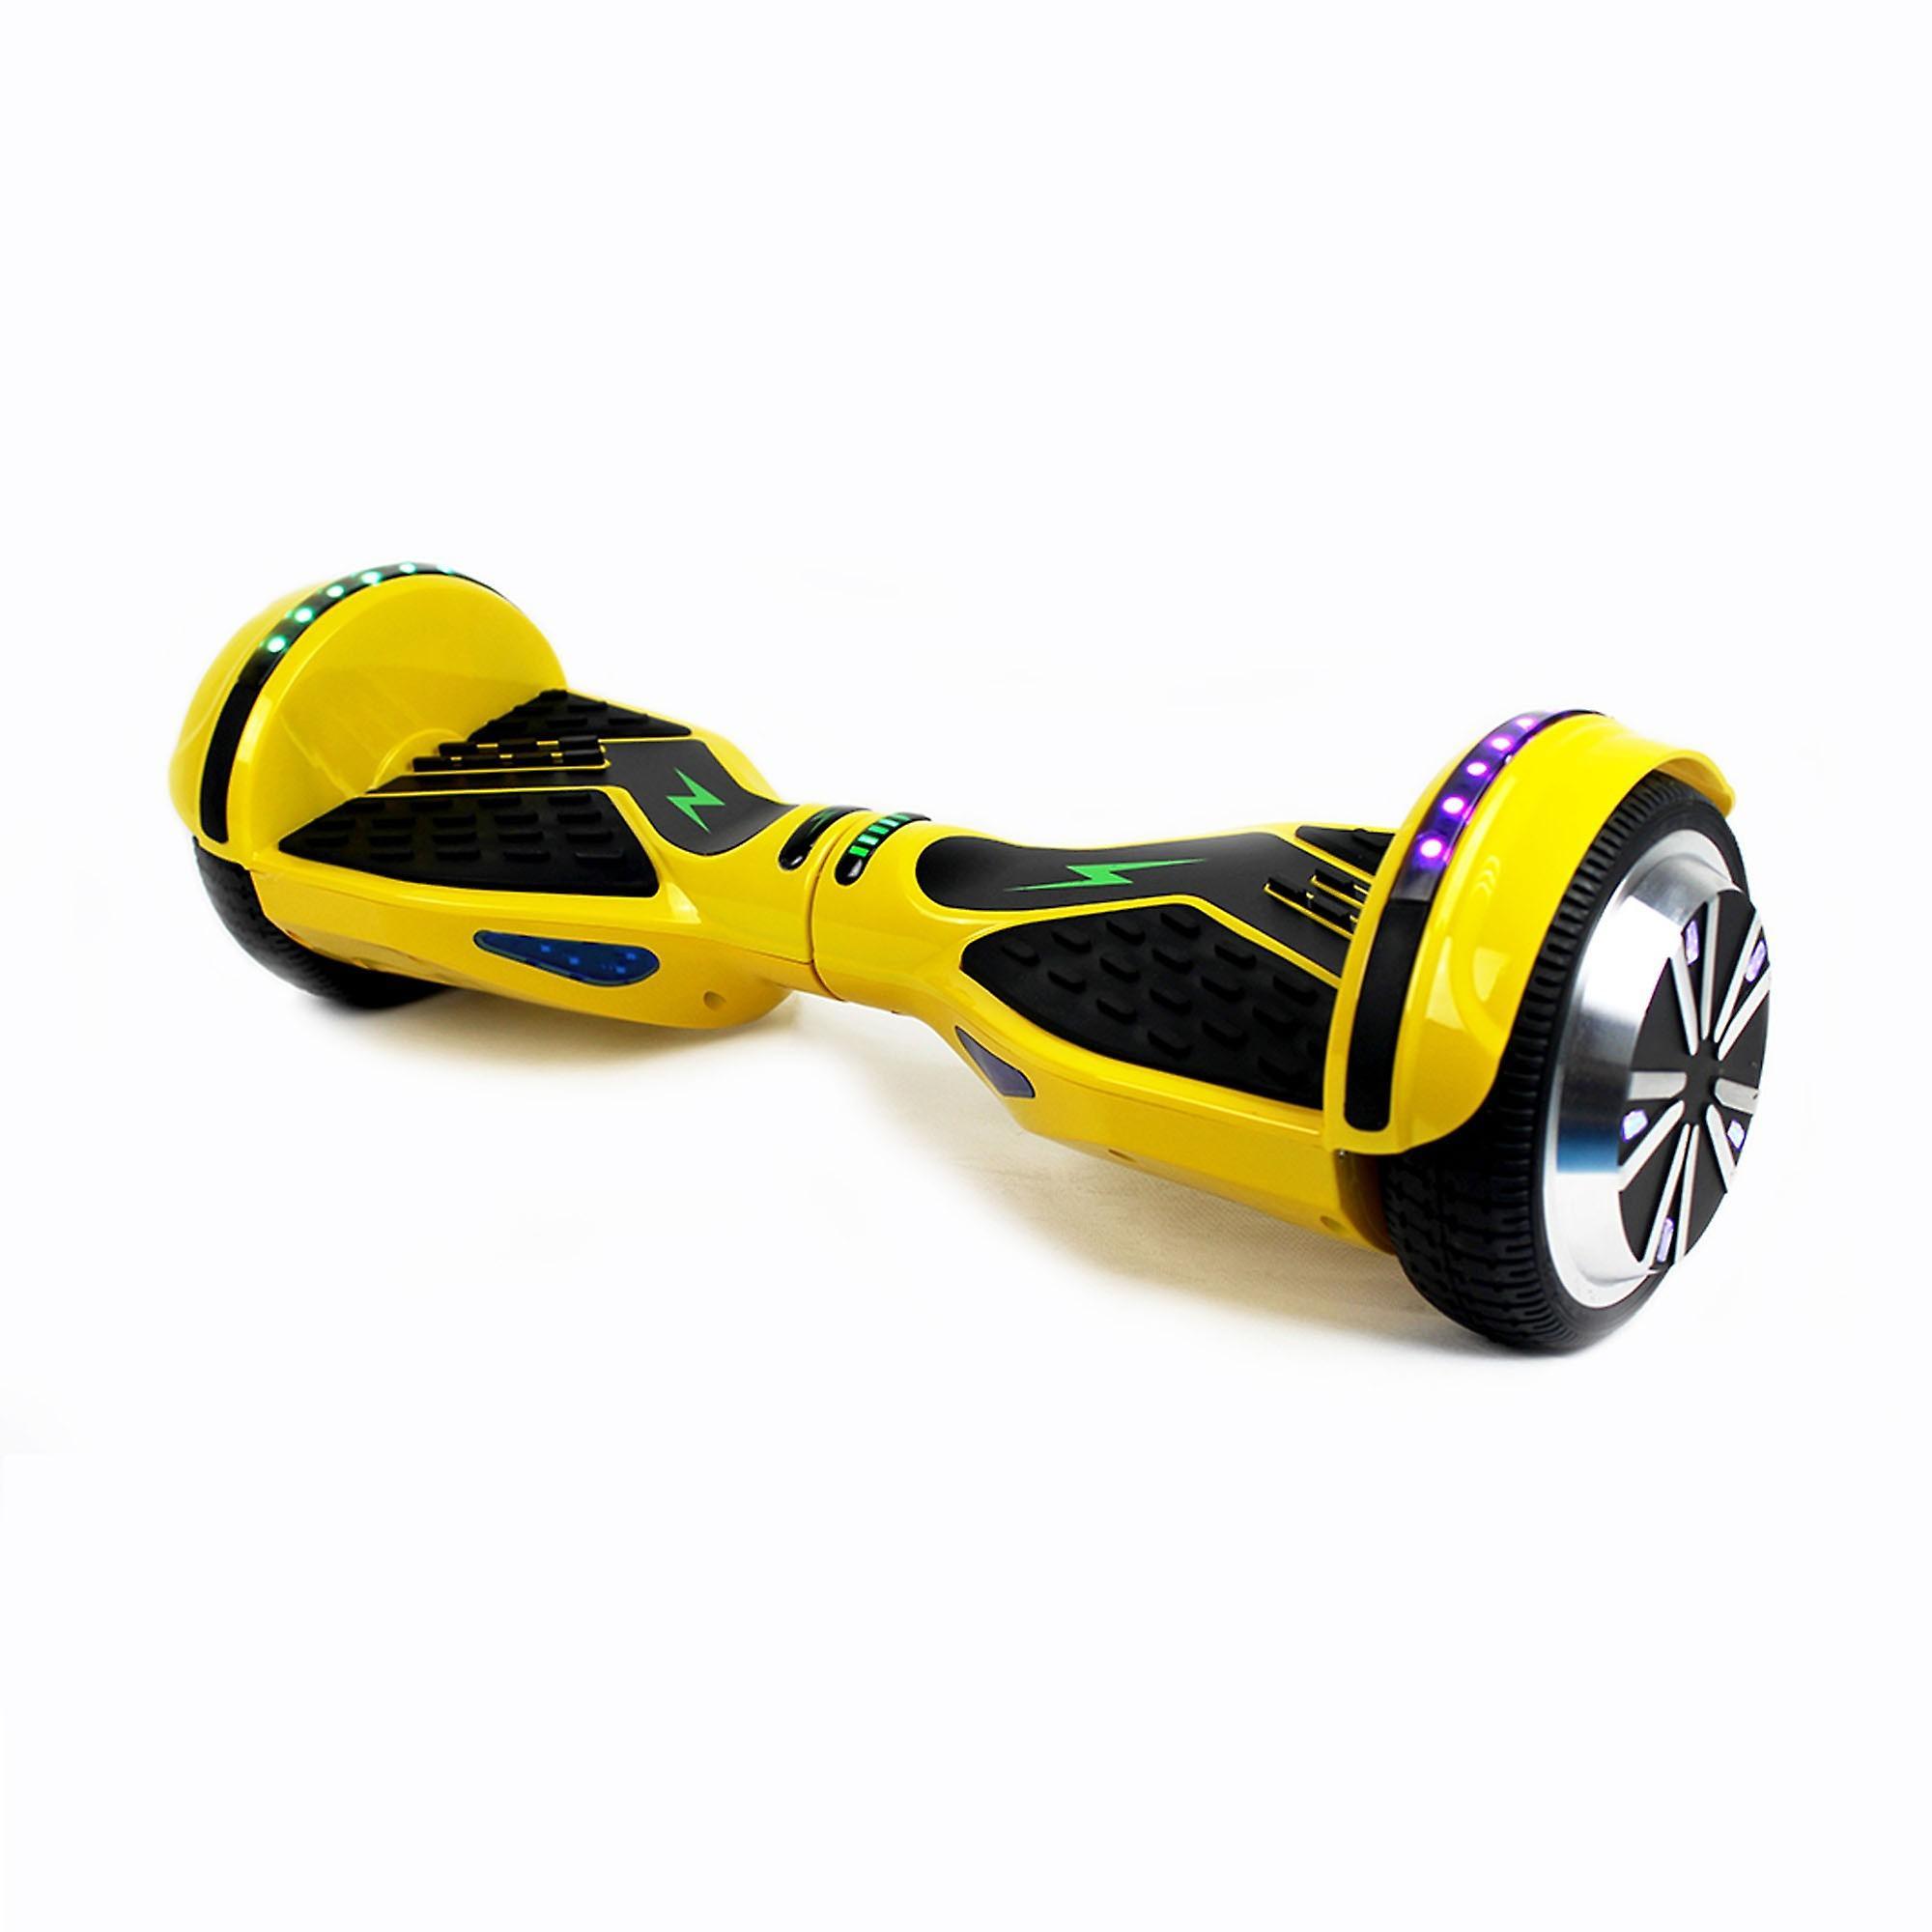 Hoverboard Skateflash K6+n Yellow